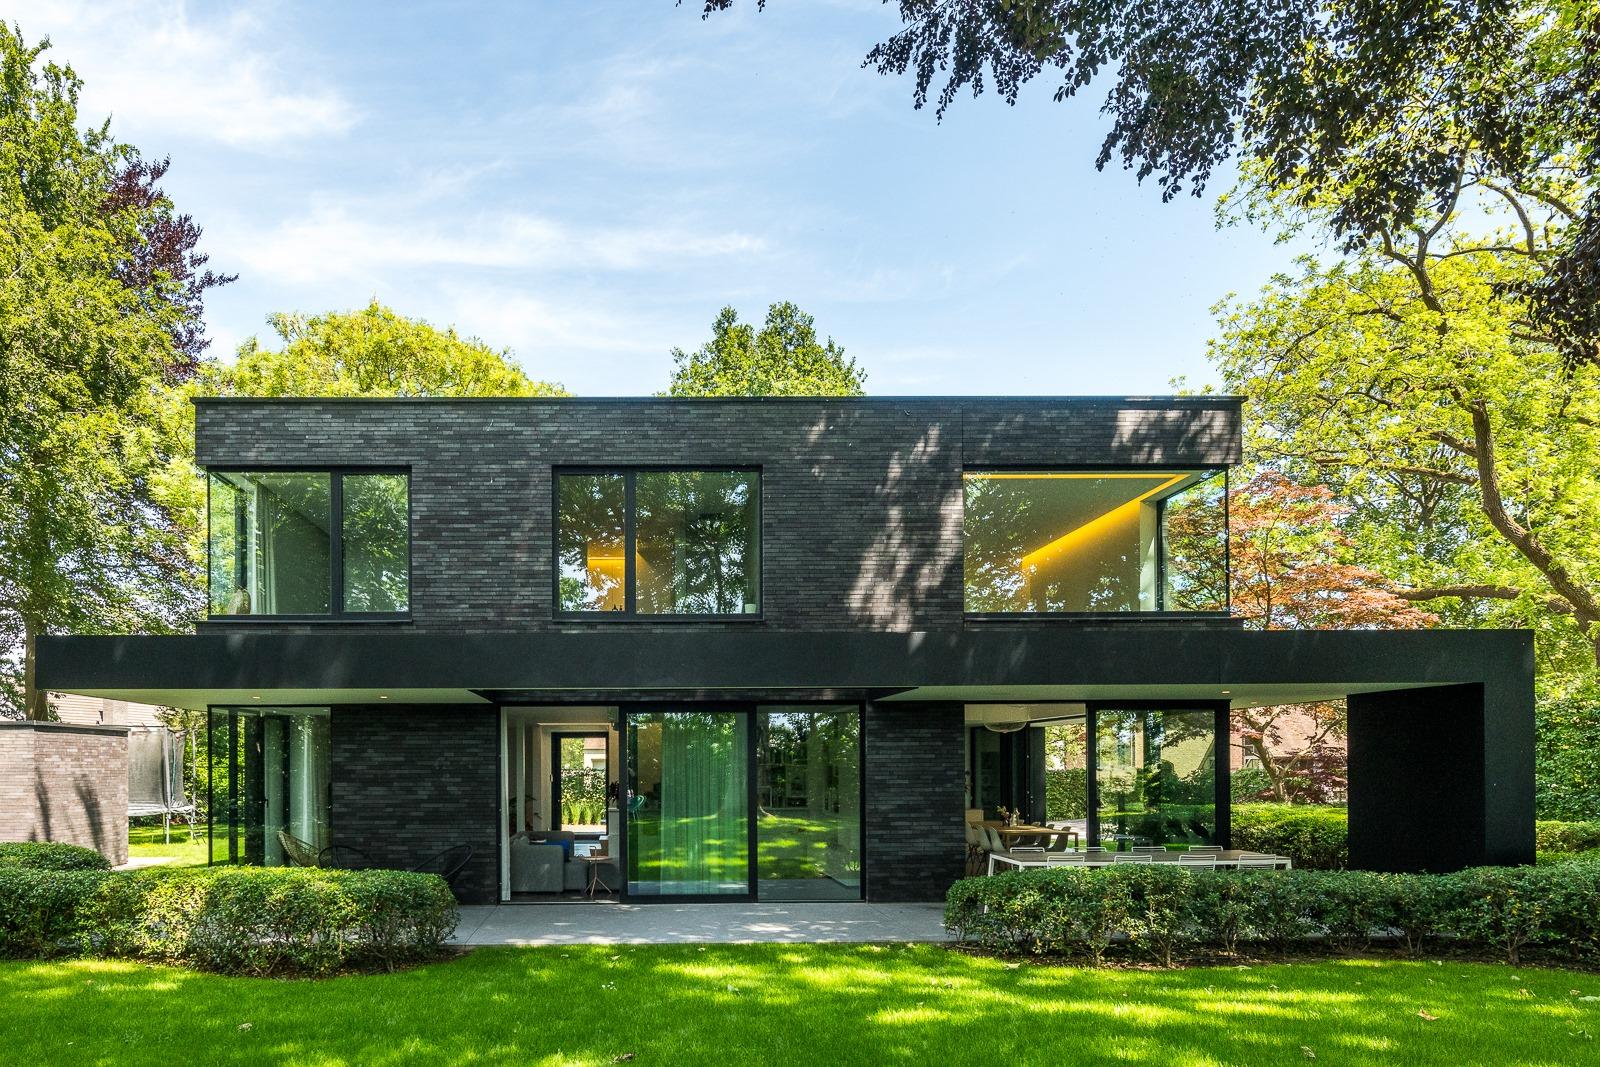 fierens | Baeyens & Beck architecten Gent | architect nieuwbouw renovatie interieur | high end | architectenbureau